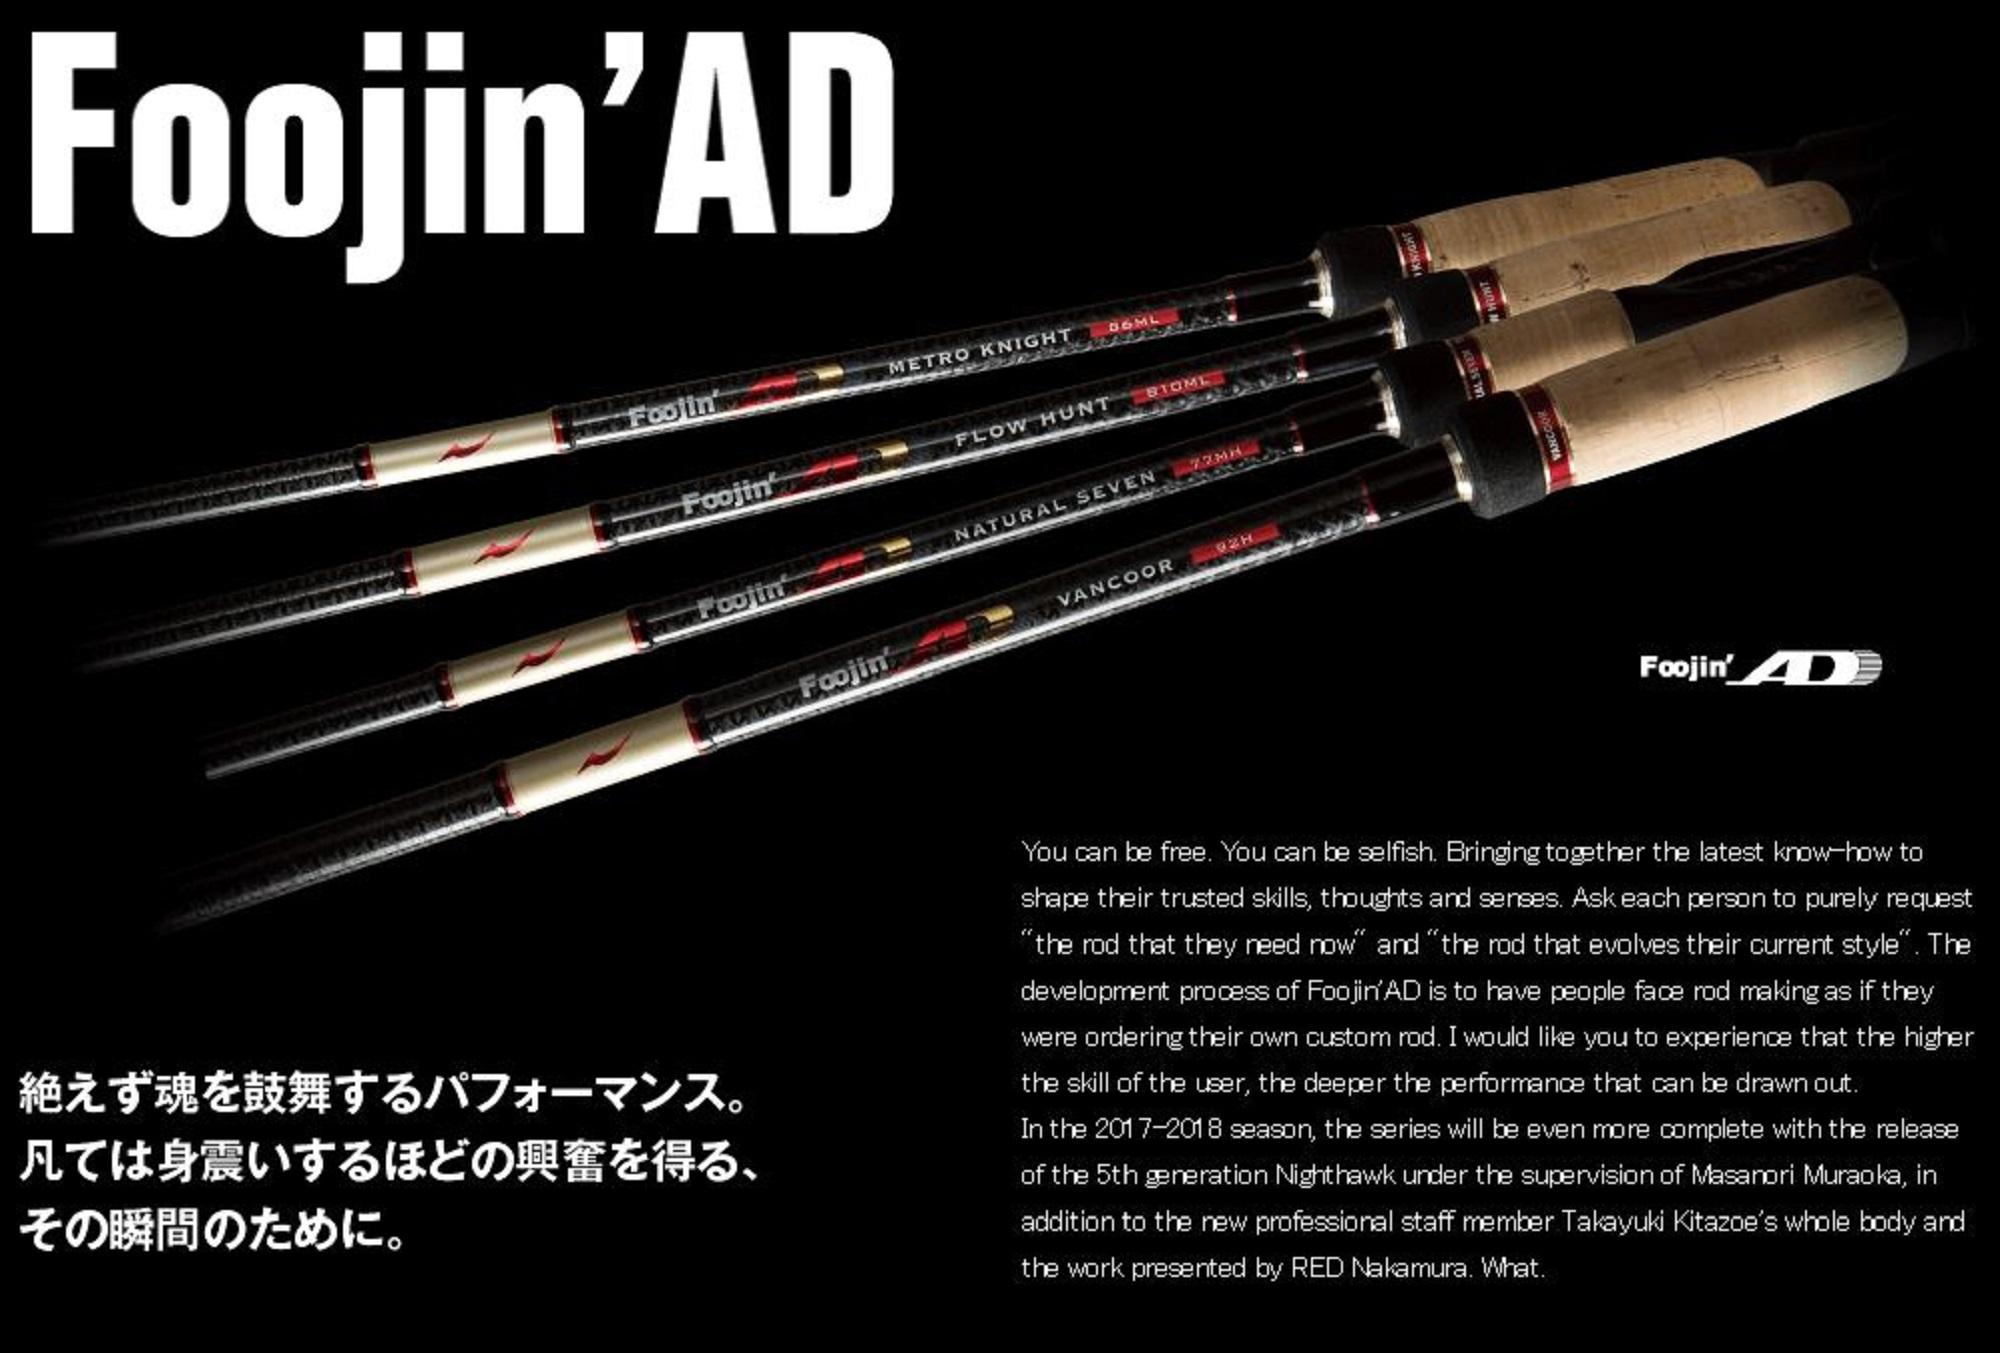 Apia Rod Spinning Foojin AD Last Edition 95MH Beast Brawl (0436)